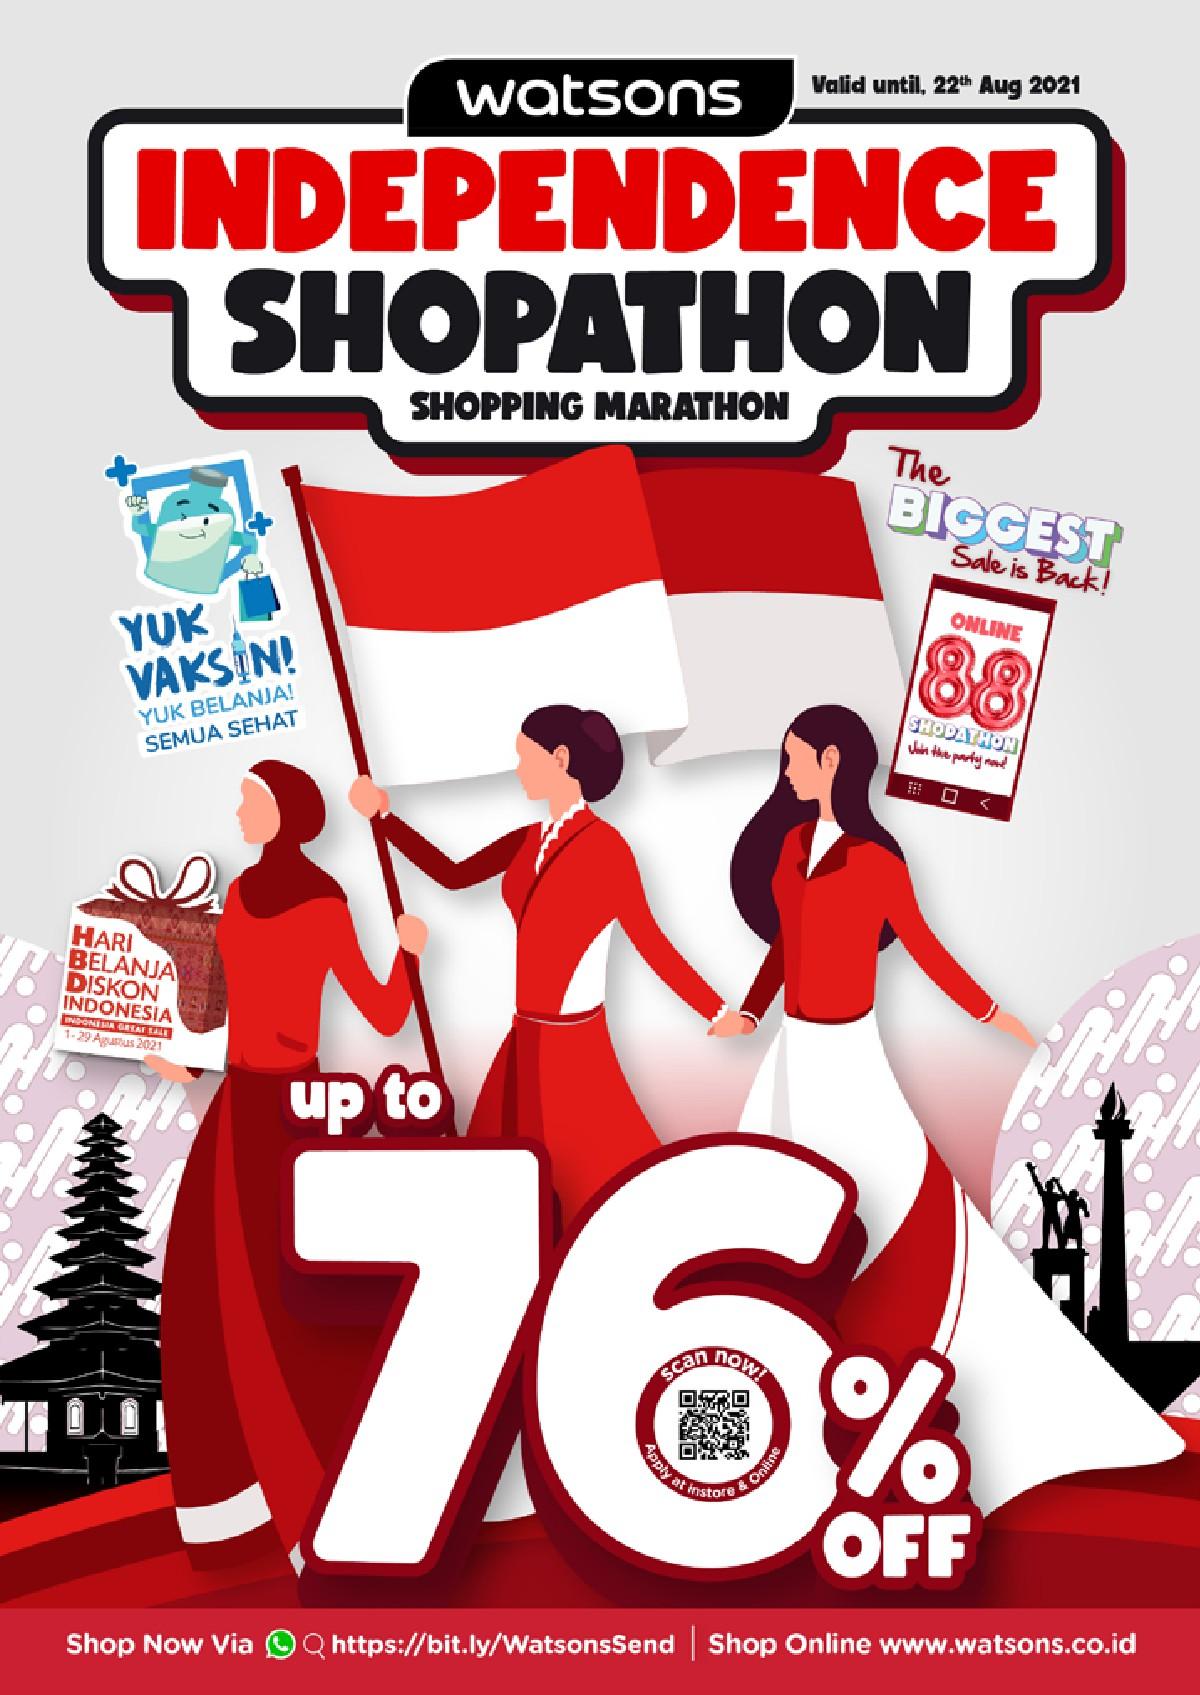 Katalog Belanja Watsons Terbaru - Independence Shopaton | Discount Up to 76% on your favorite products